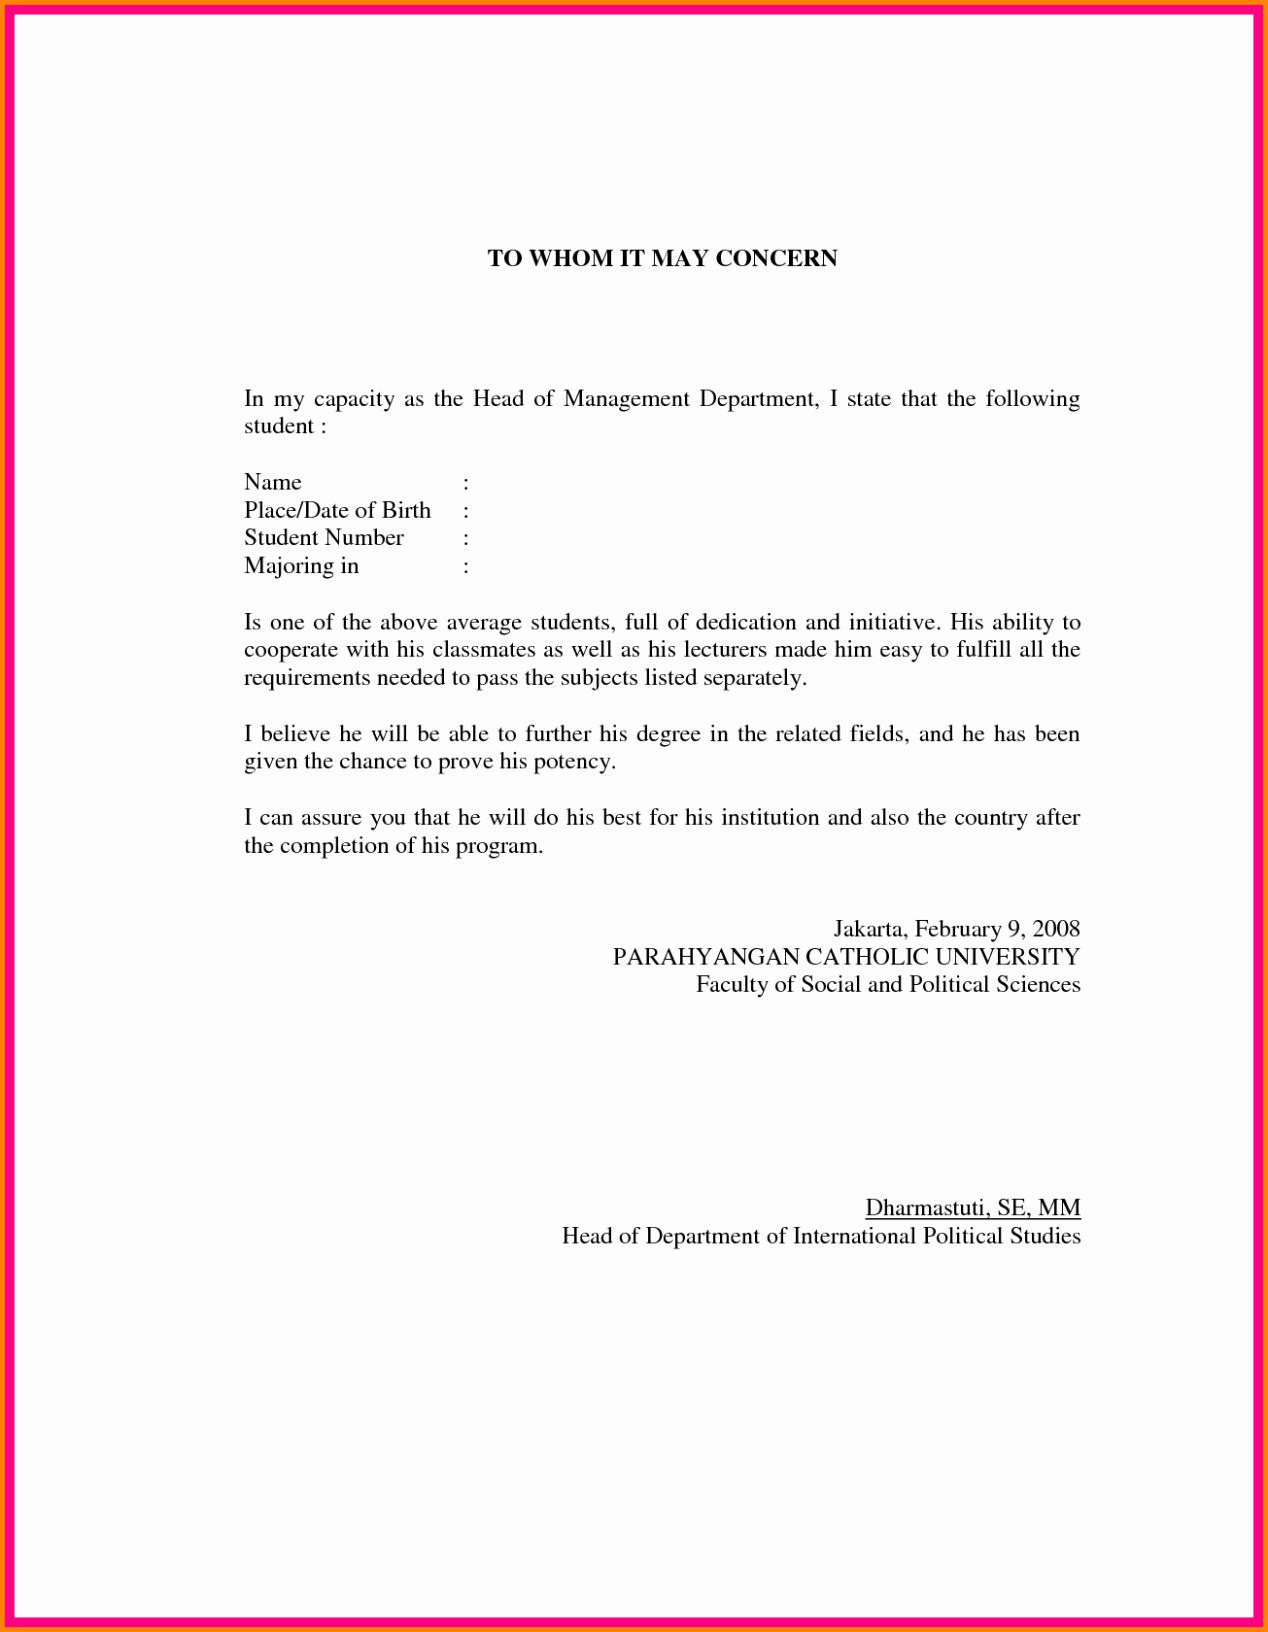 Formats for Letters Of Recommendation Elegant Letter Of Re Mendation format Sample Template